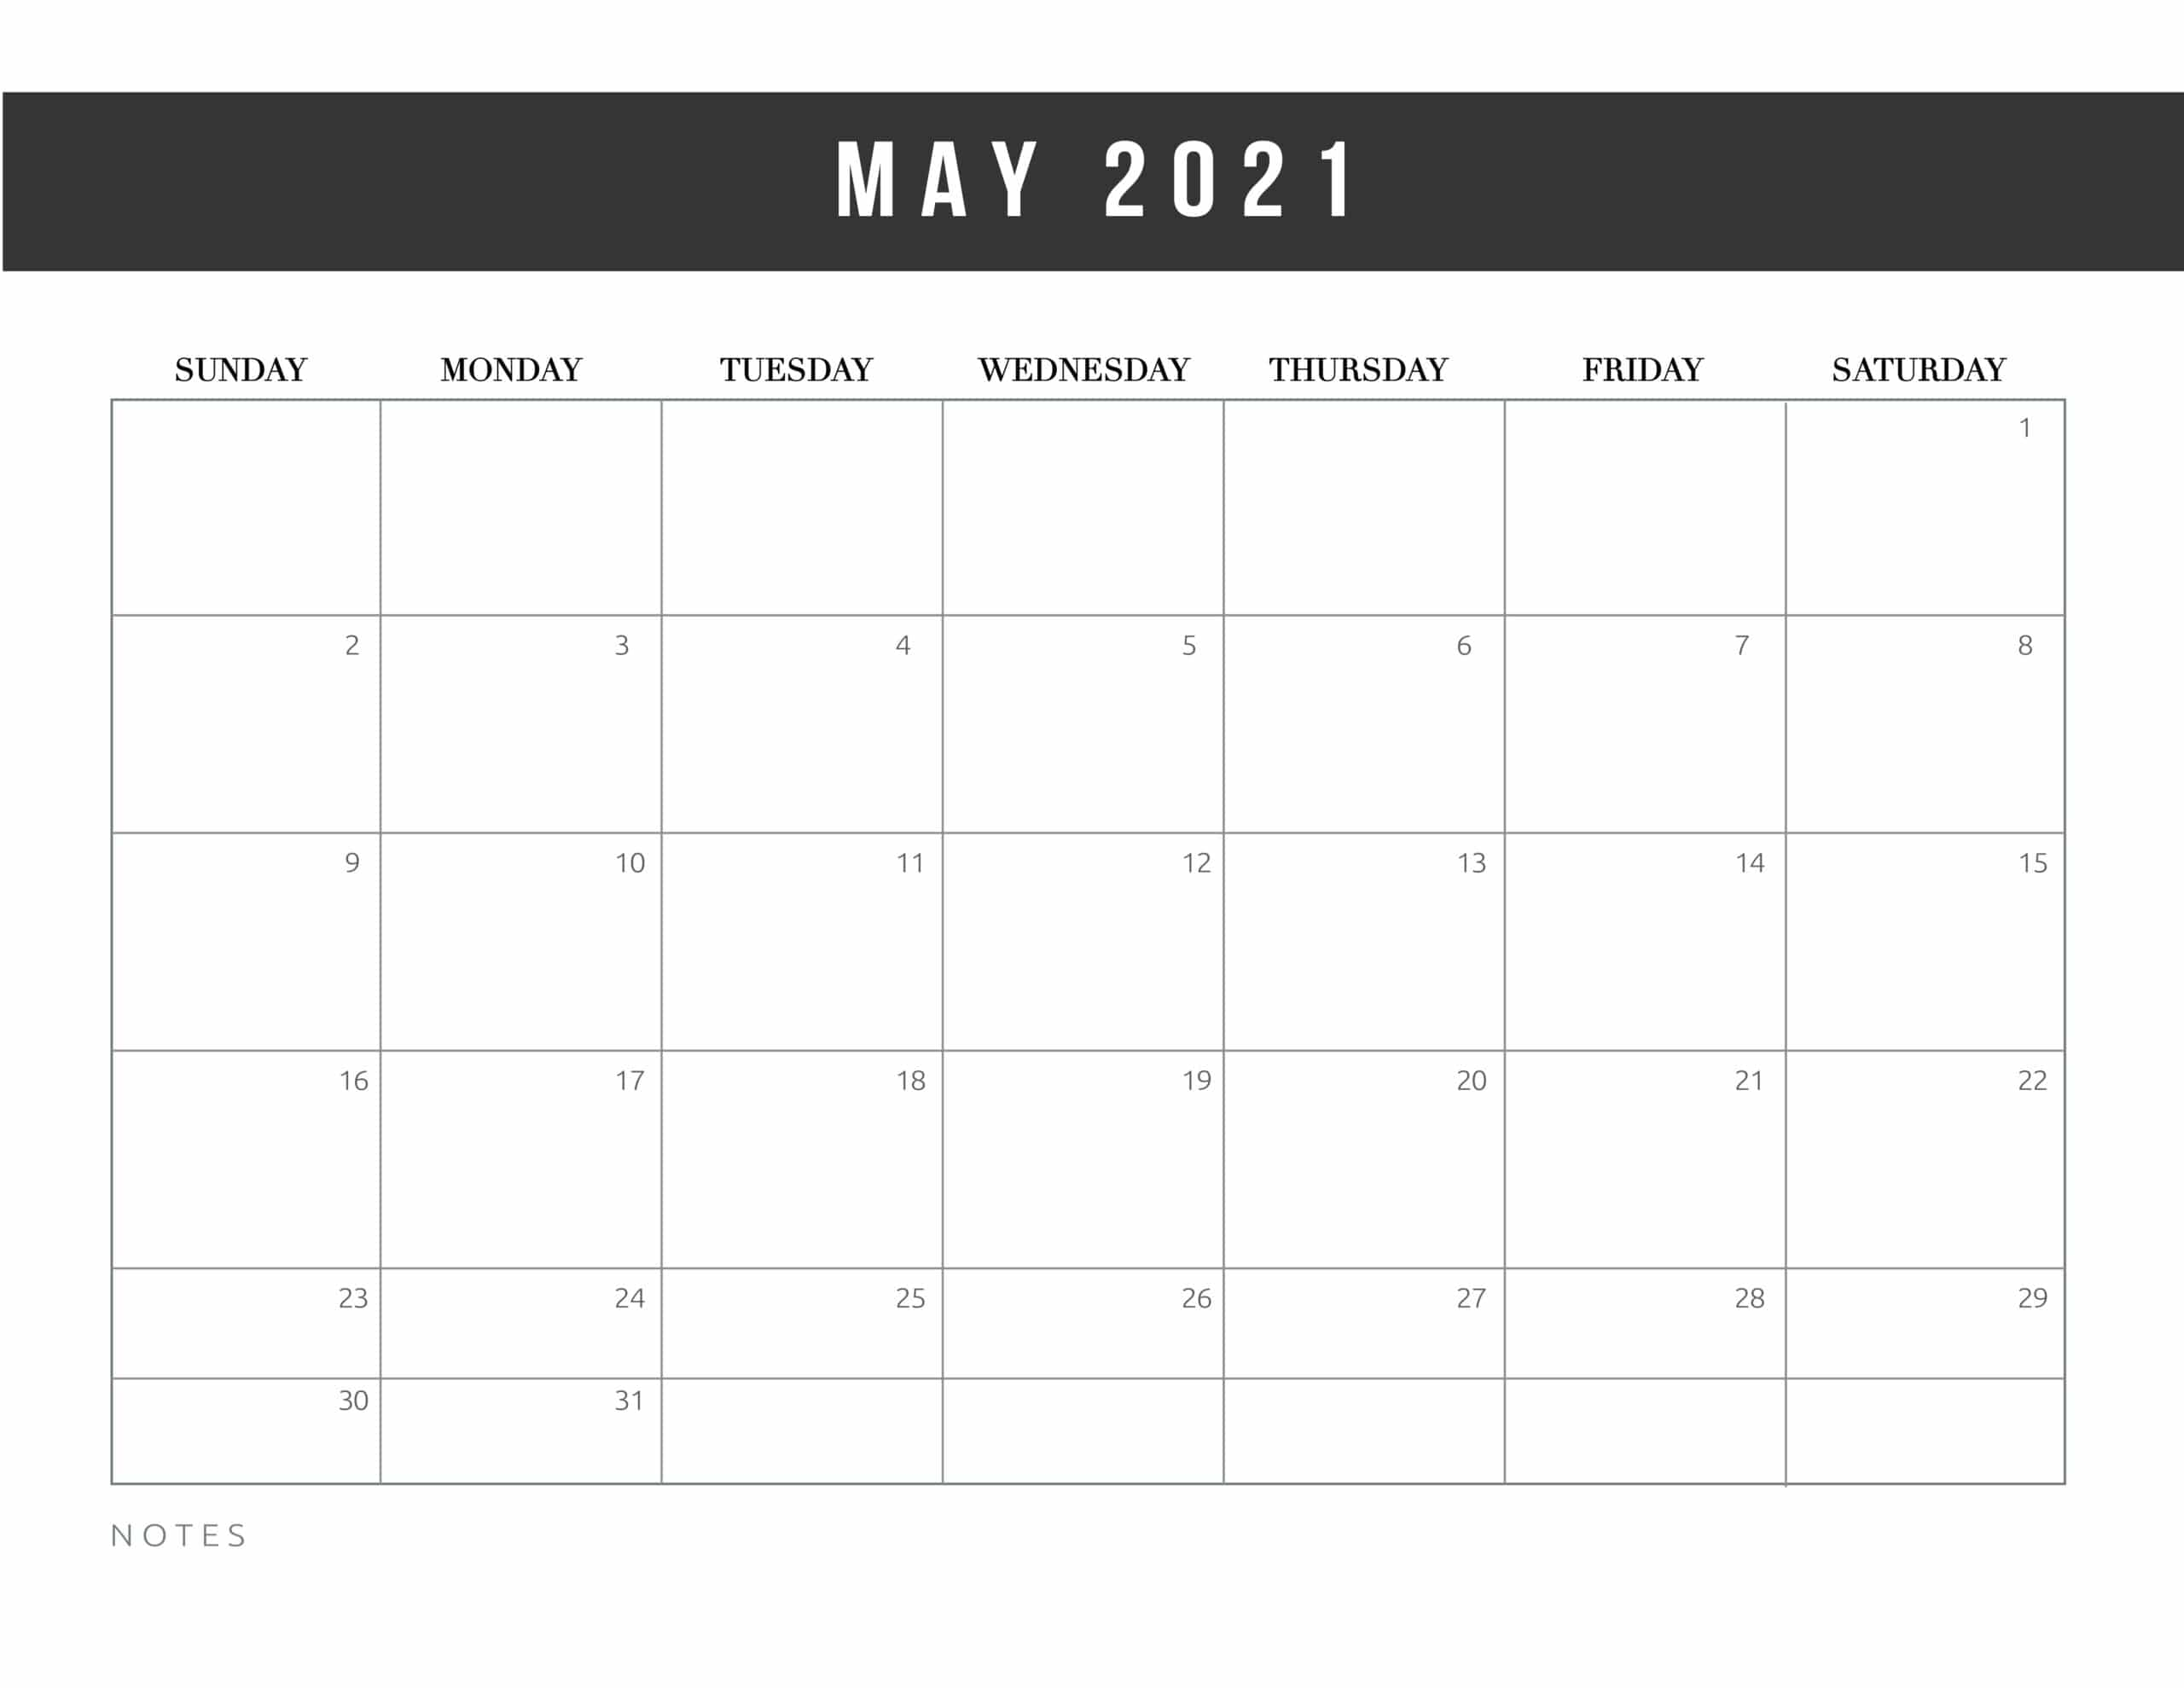 May 2021 blank calendar